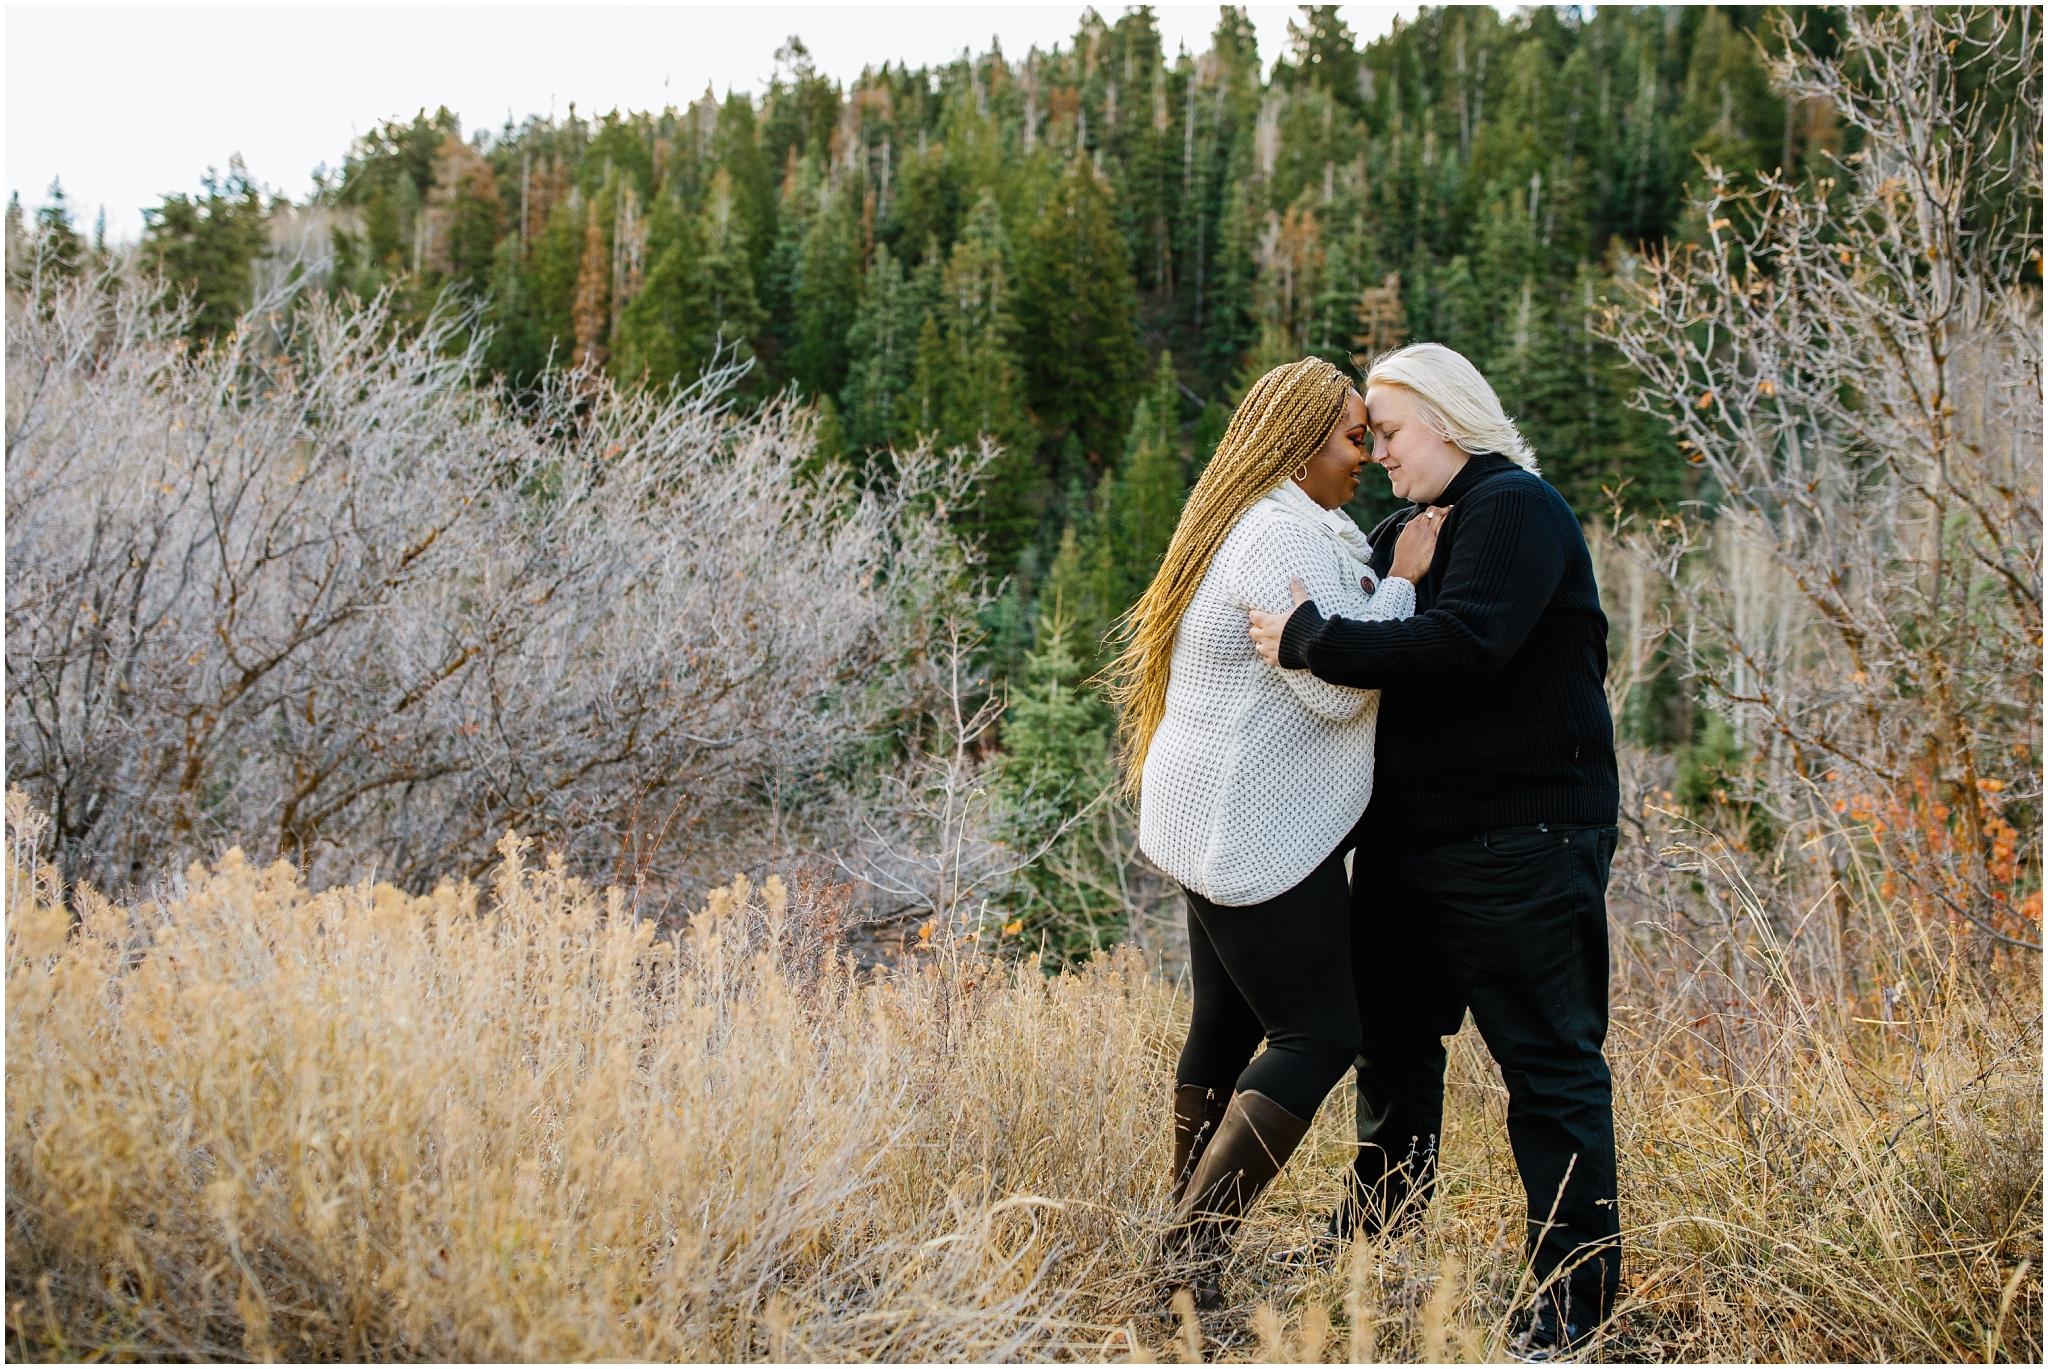 LisaTiffany2018-123_Lizzie-B-Imagery-Utah-Family-Photographer-Salt-Lake-City-Park-City-Miners-Hospital-Community-Center.jpg